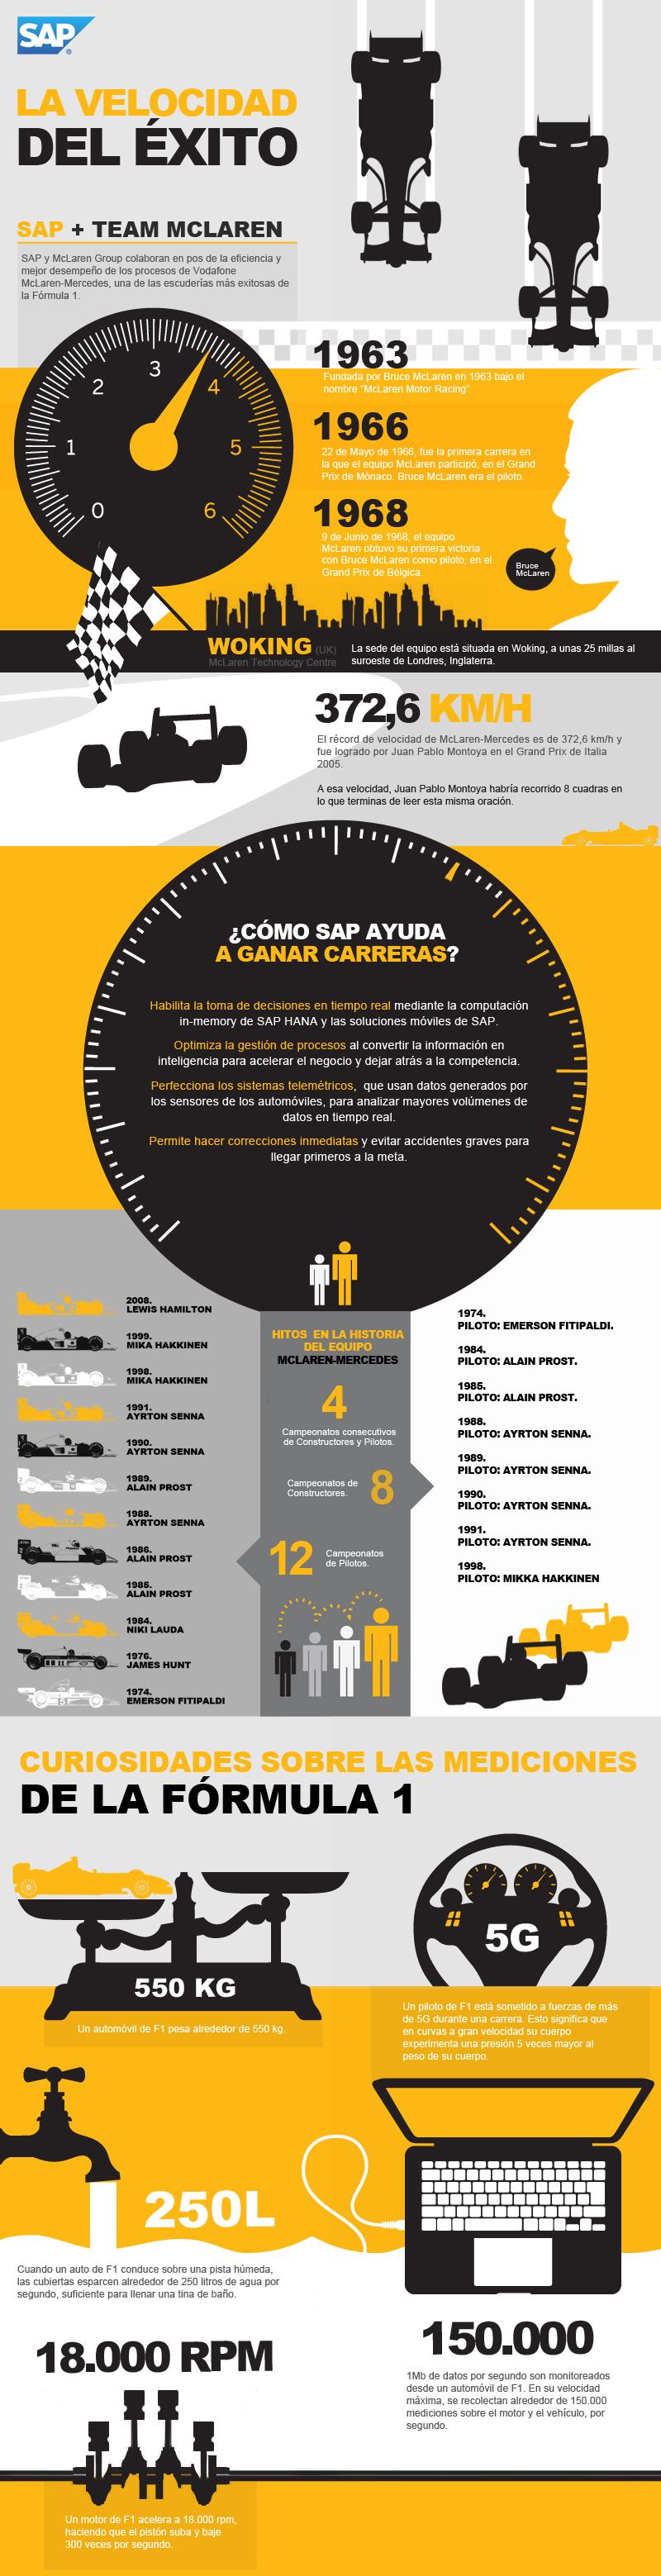 Infografia La Velocidad del Exito